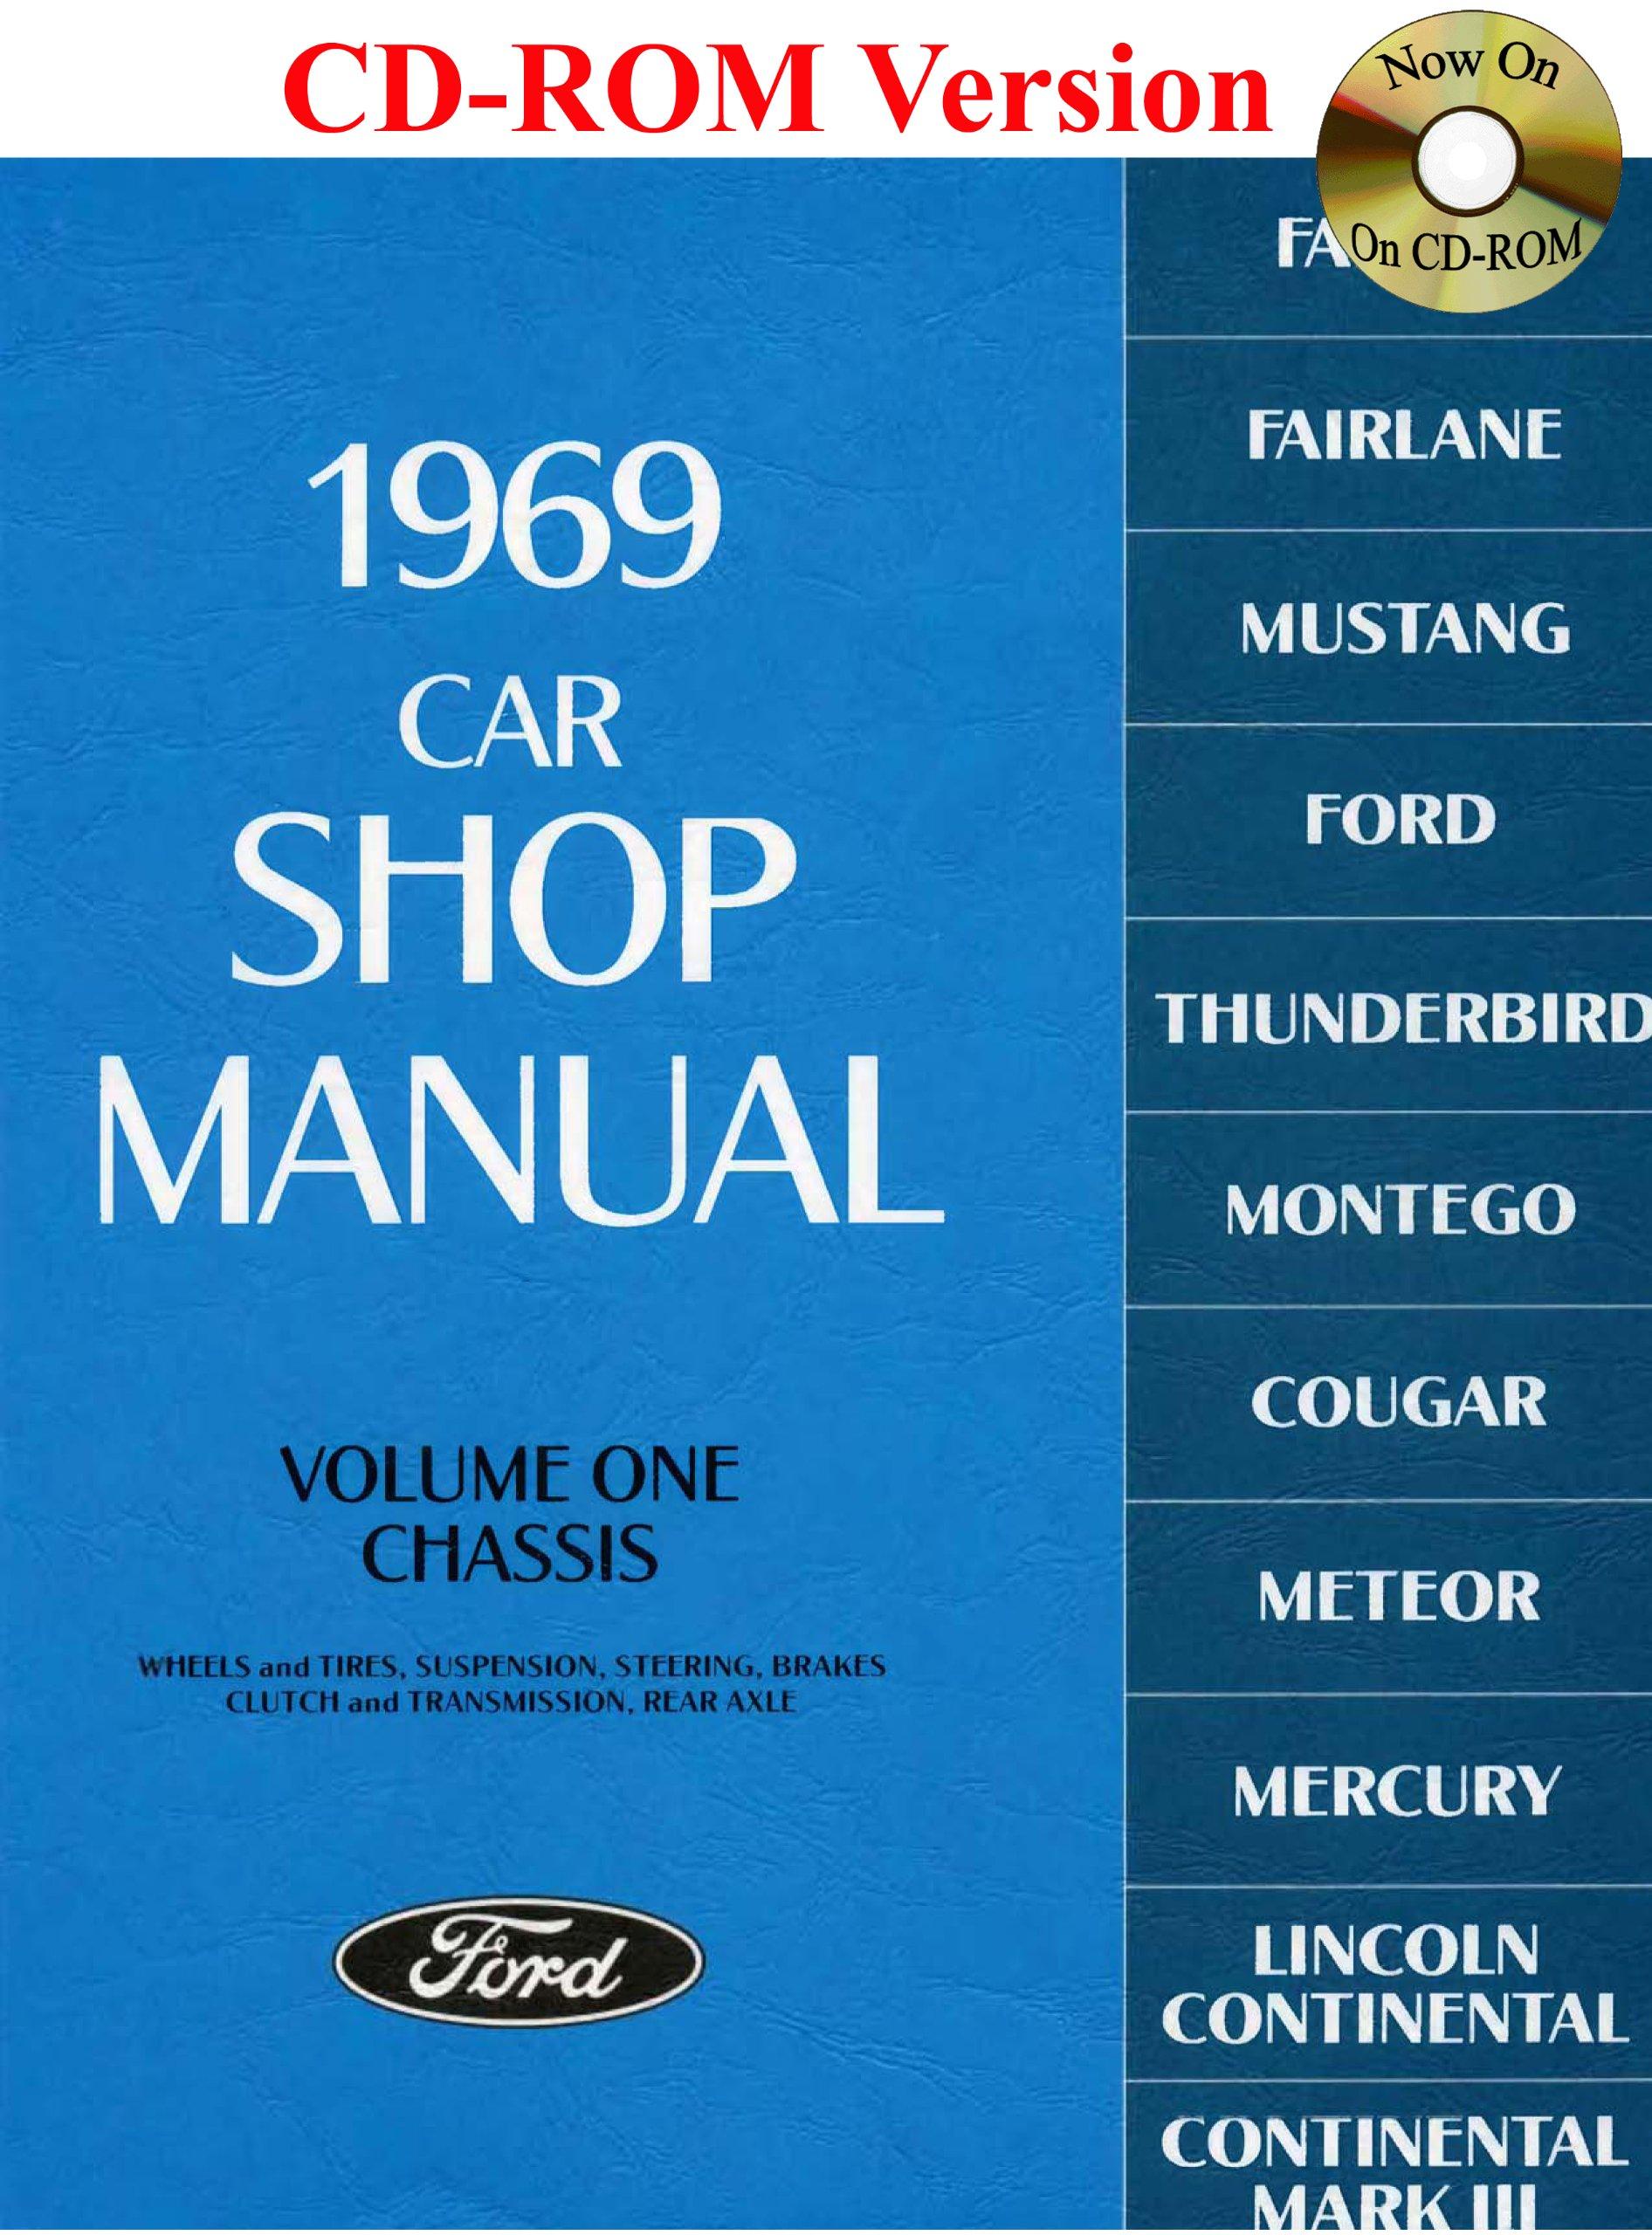 1969 Ford Car Shop Manual (Vol I-V): Ford Motor Company, David E. LeBlanc:  9780967321165: Amazon.com: Books